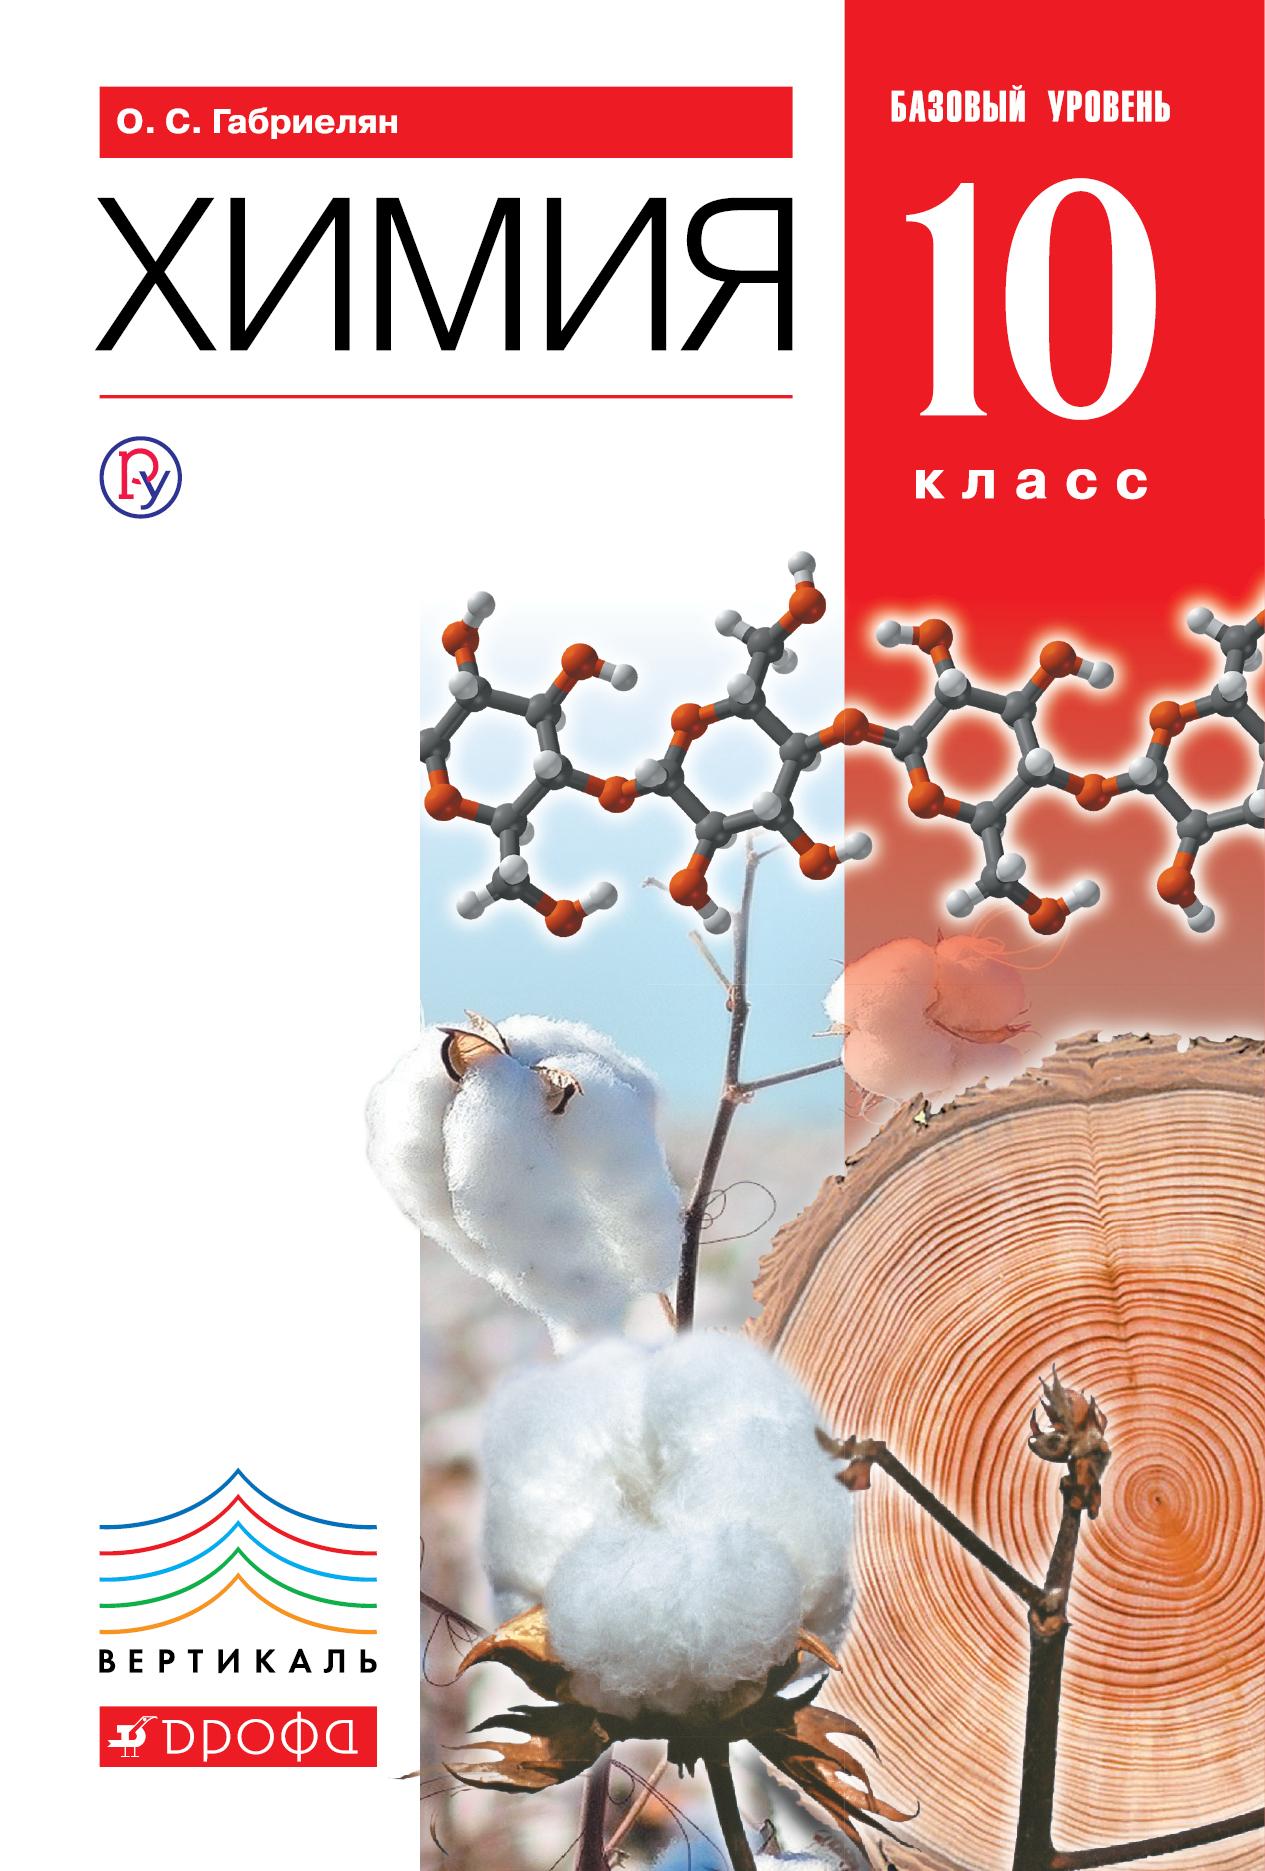 химия 8 класс габриелян фгос гдз 2018